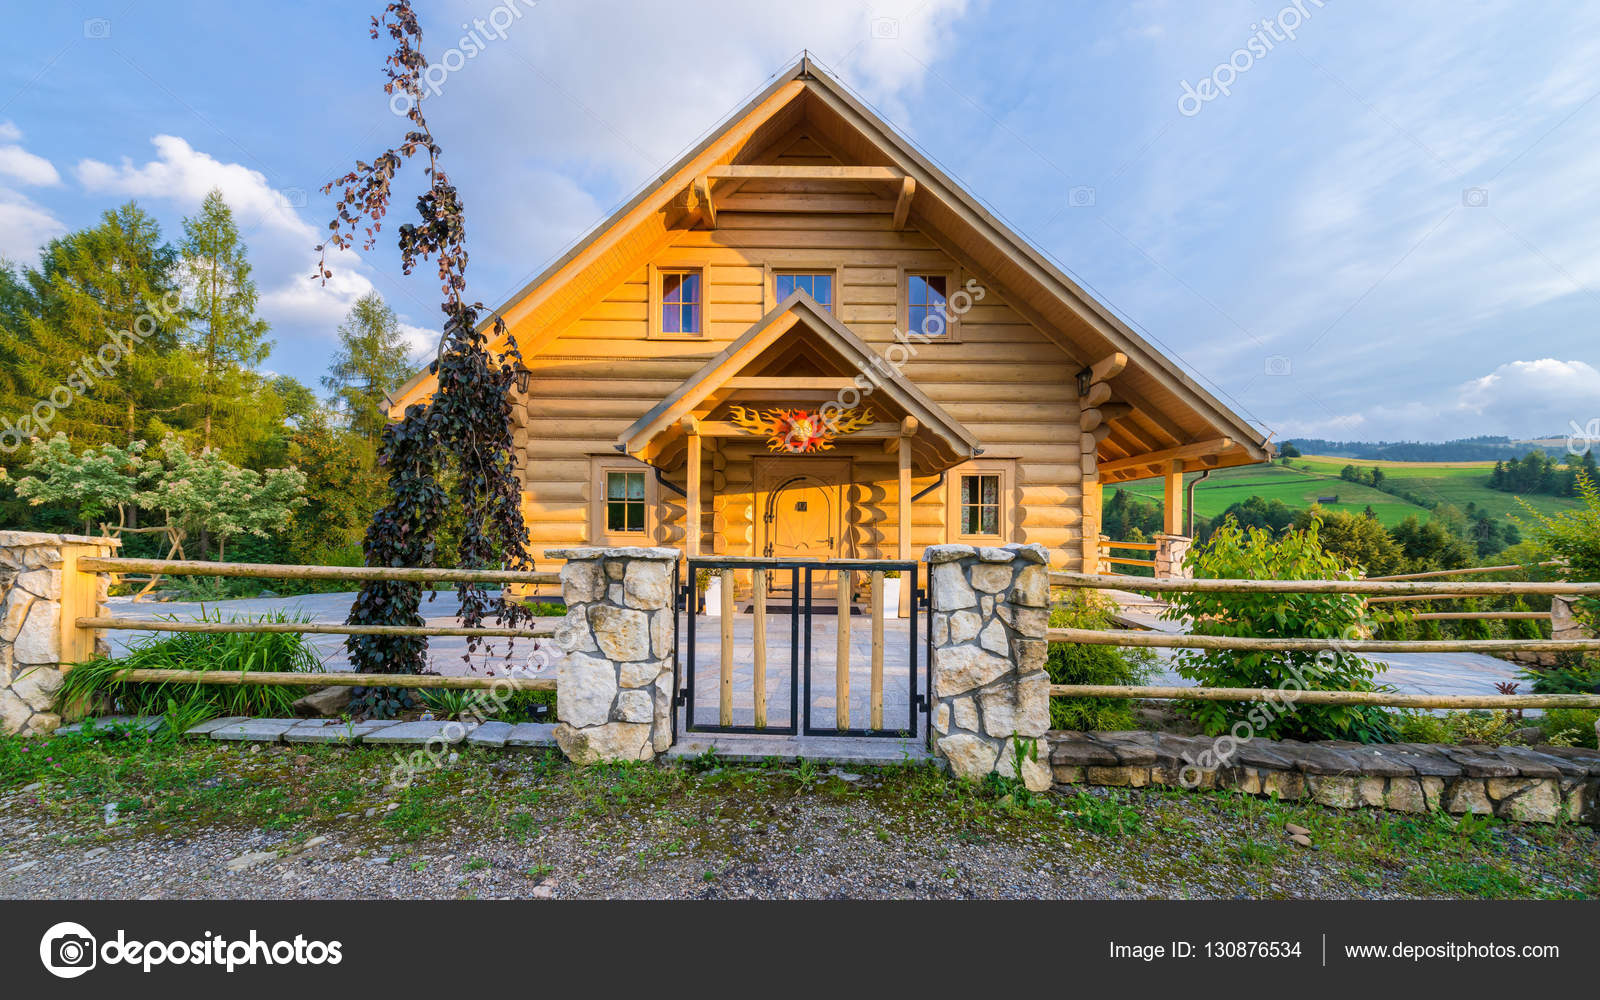 casa tradizionale di montagna in legno costruita da